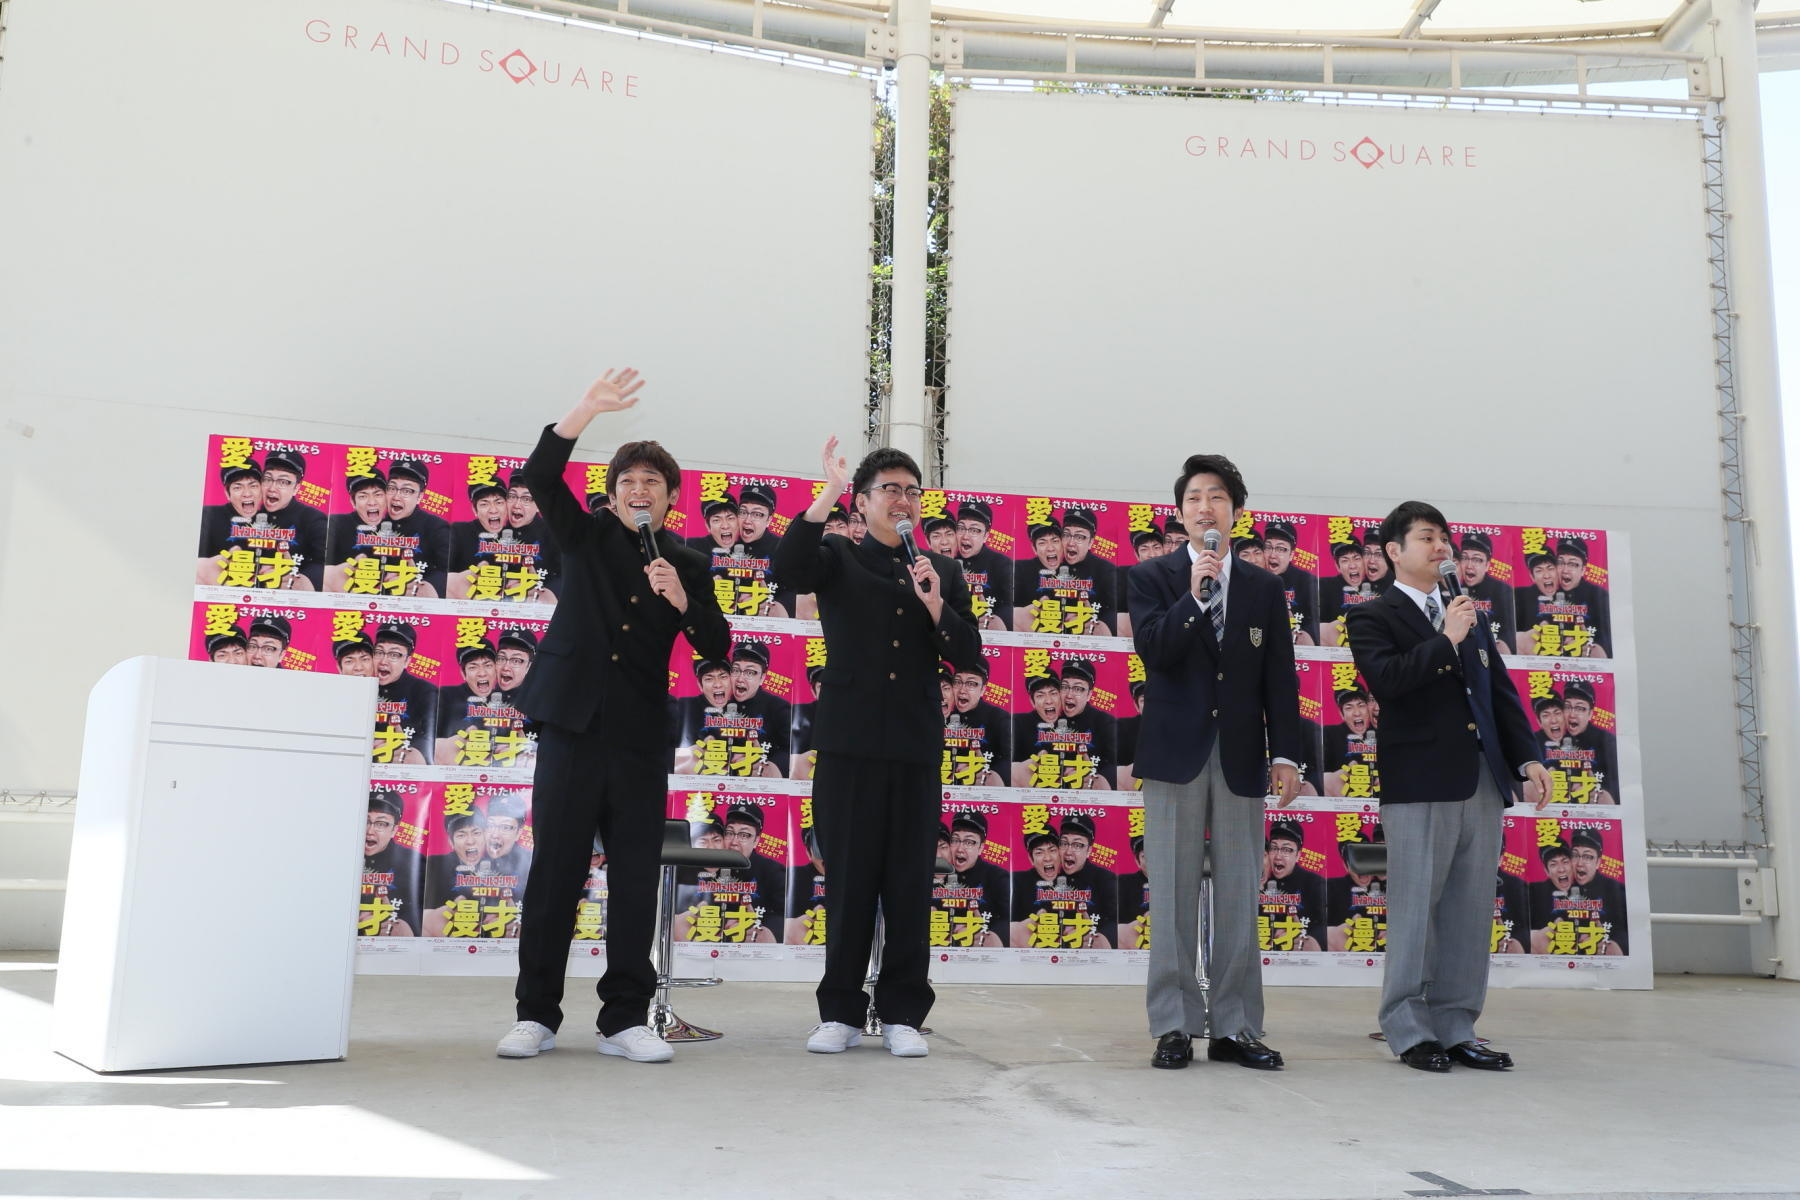 http://news.yoshimoto.co.jp/20170413154305-f607dff6232763524eaf5db873fa0aea302edc25.jpg